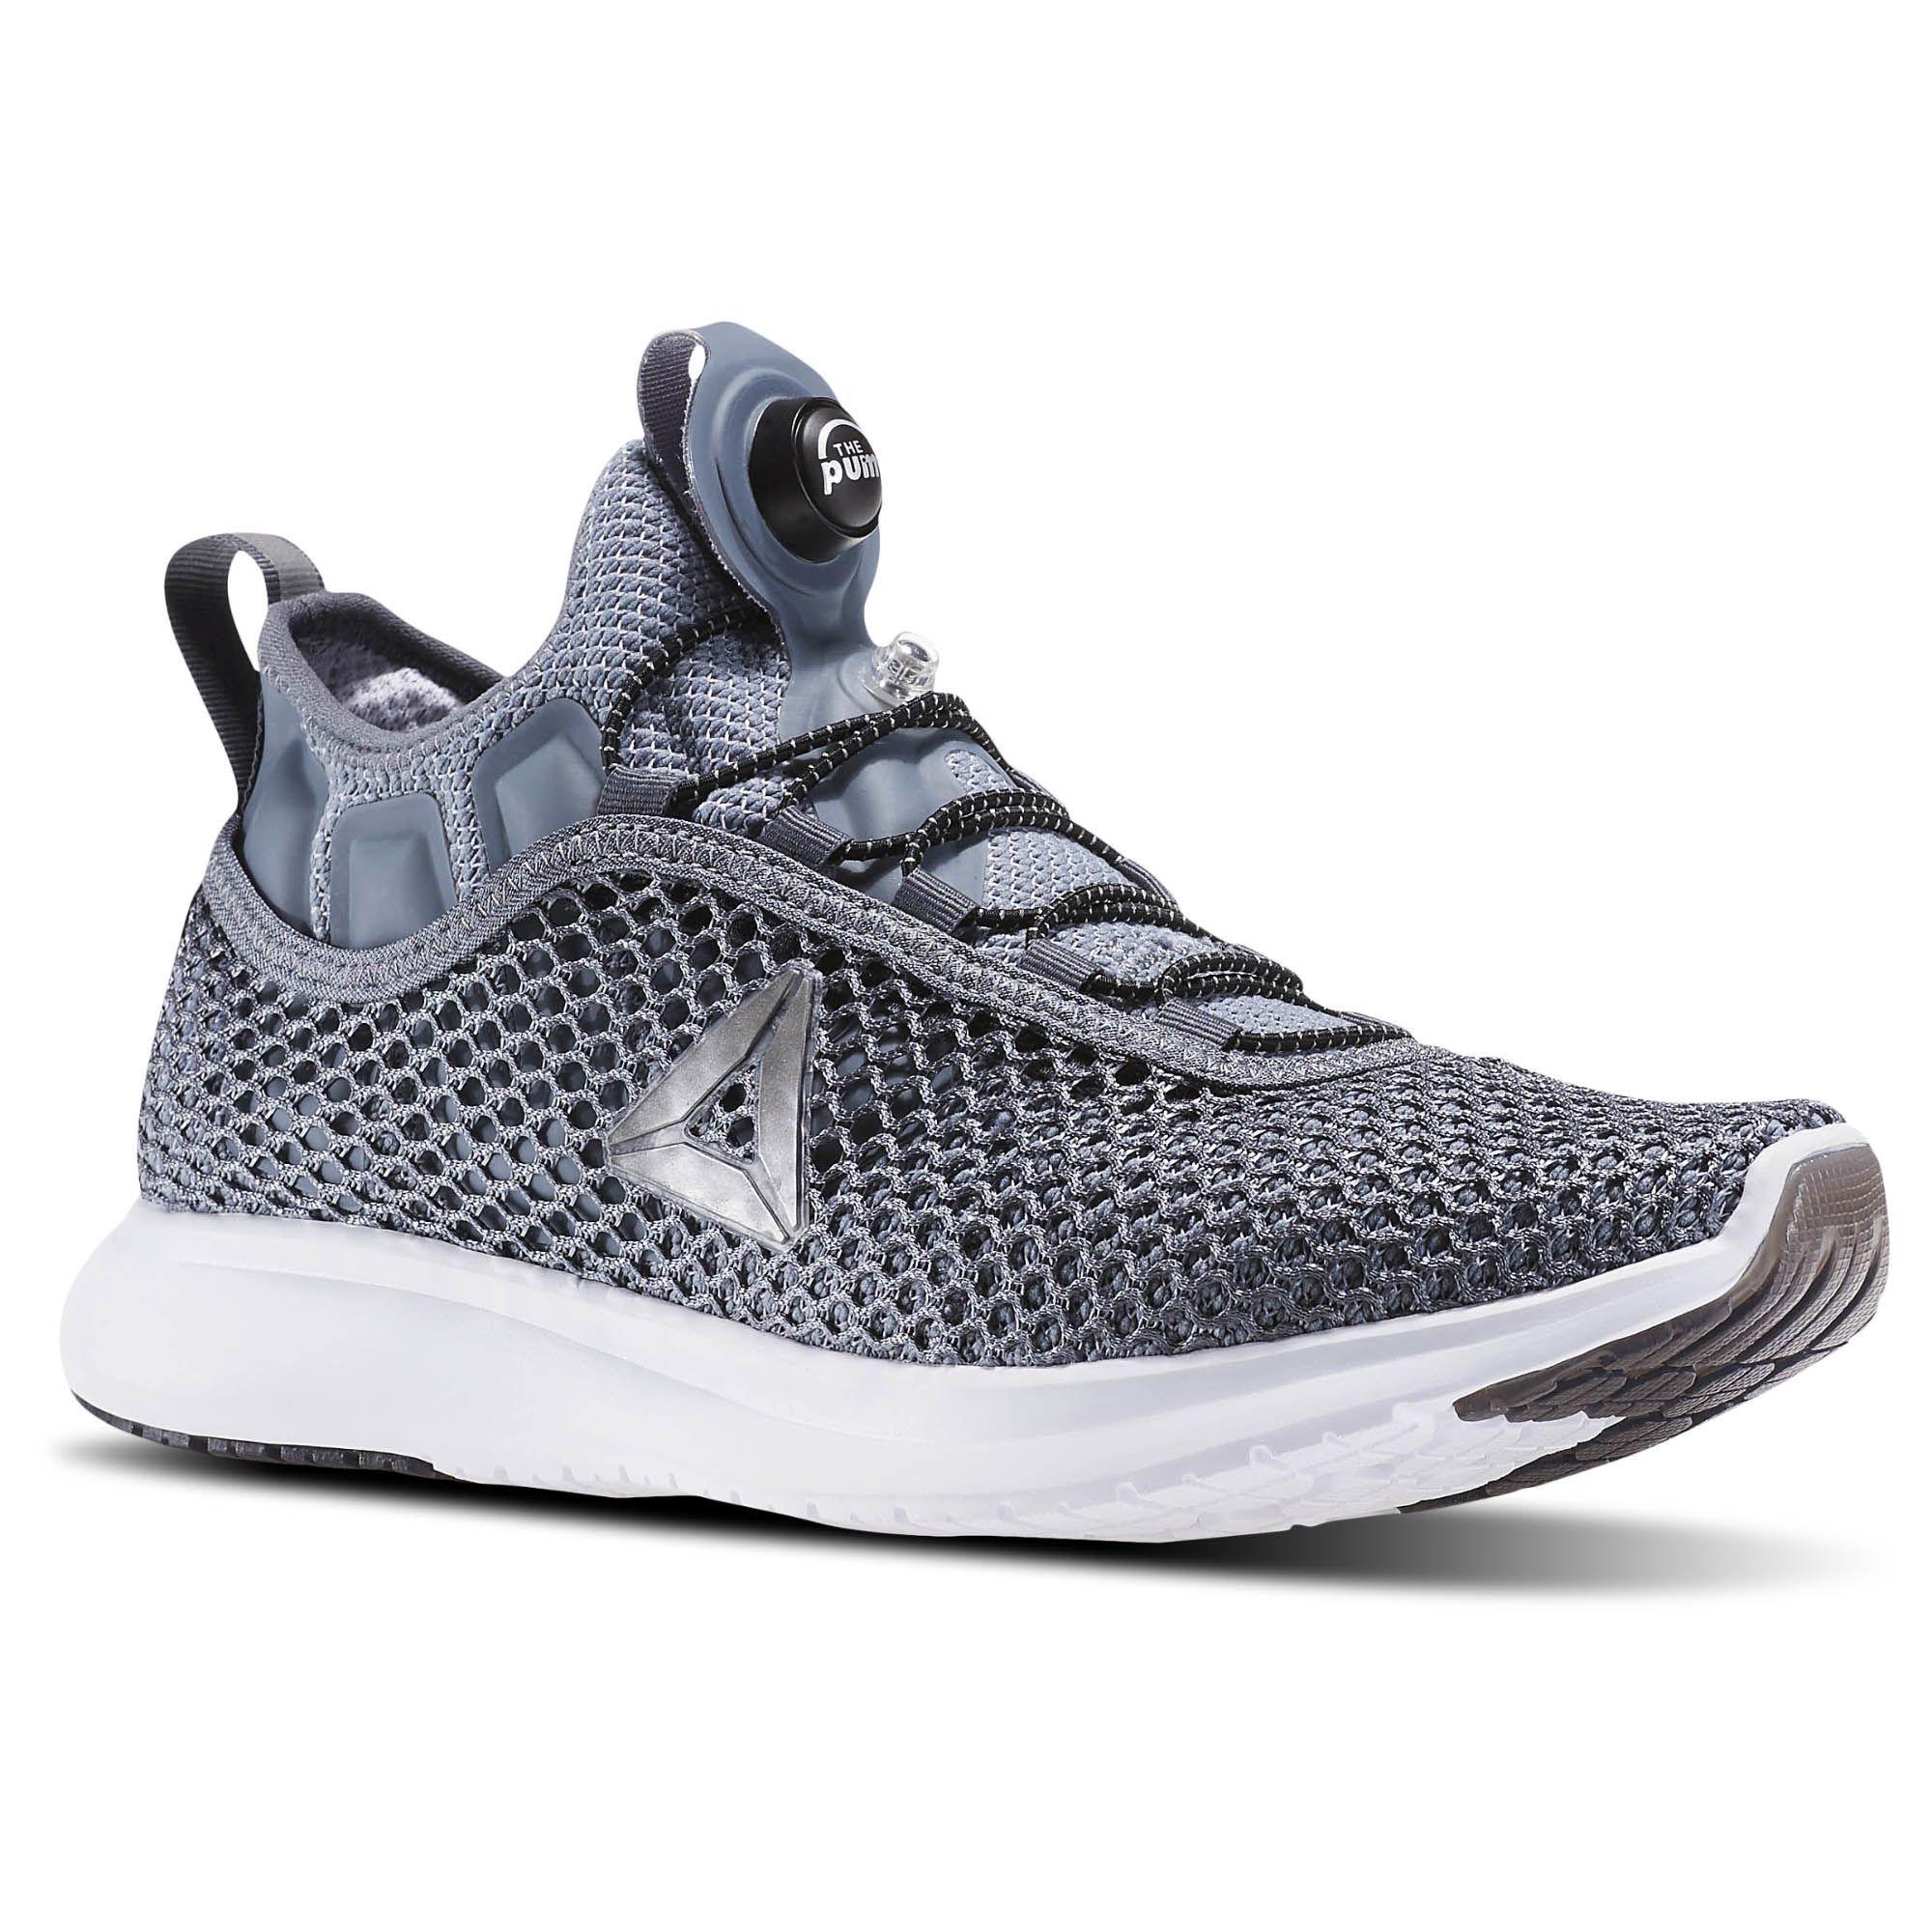 Plus - Gris | Reebok France. Adidas WomenReebokVortexRunning  SneakersRunning ShoesPumpingCoursesCleatsSports Shoes